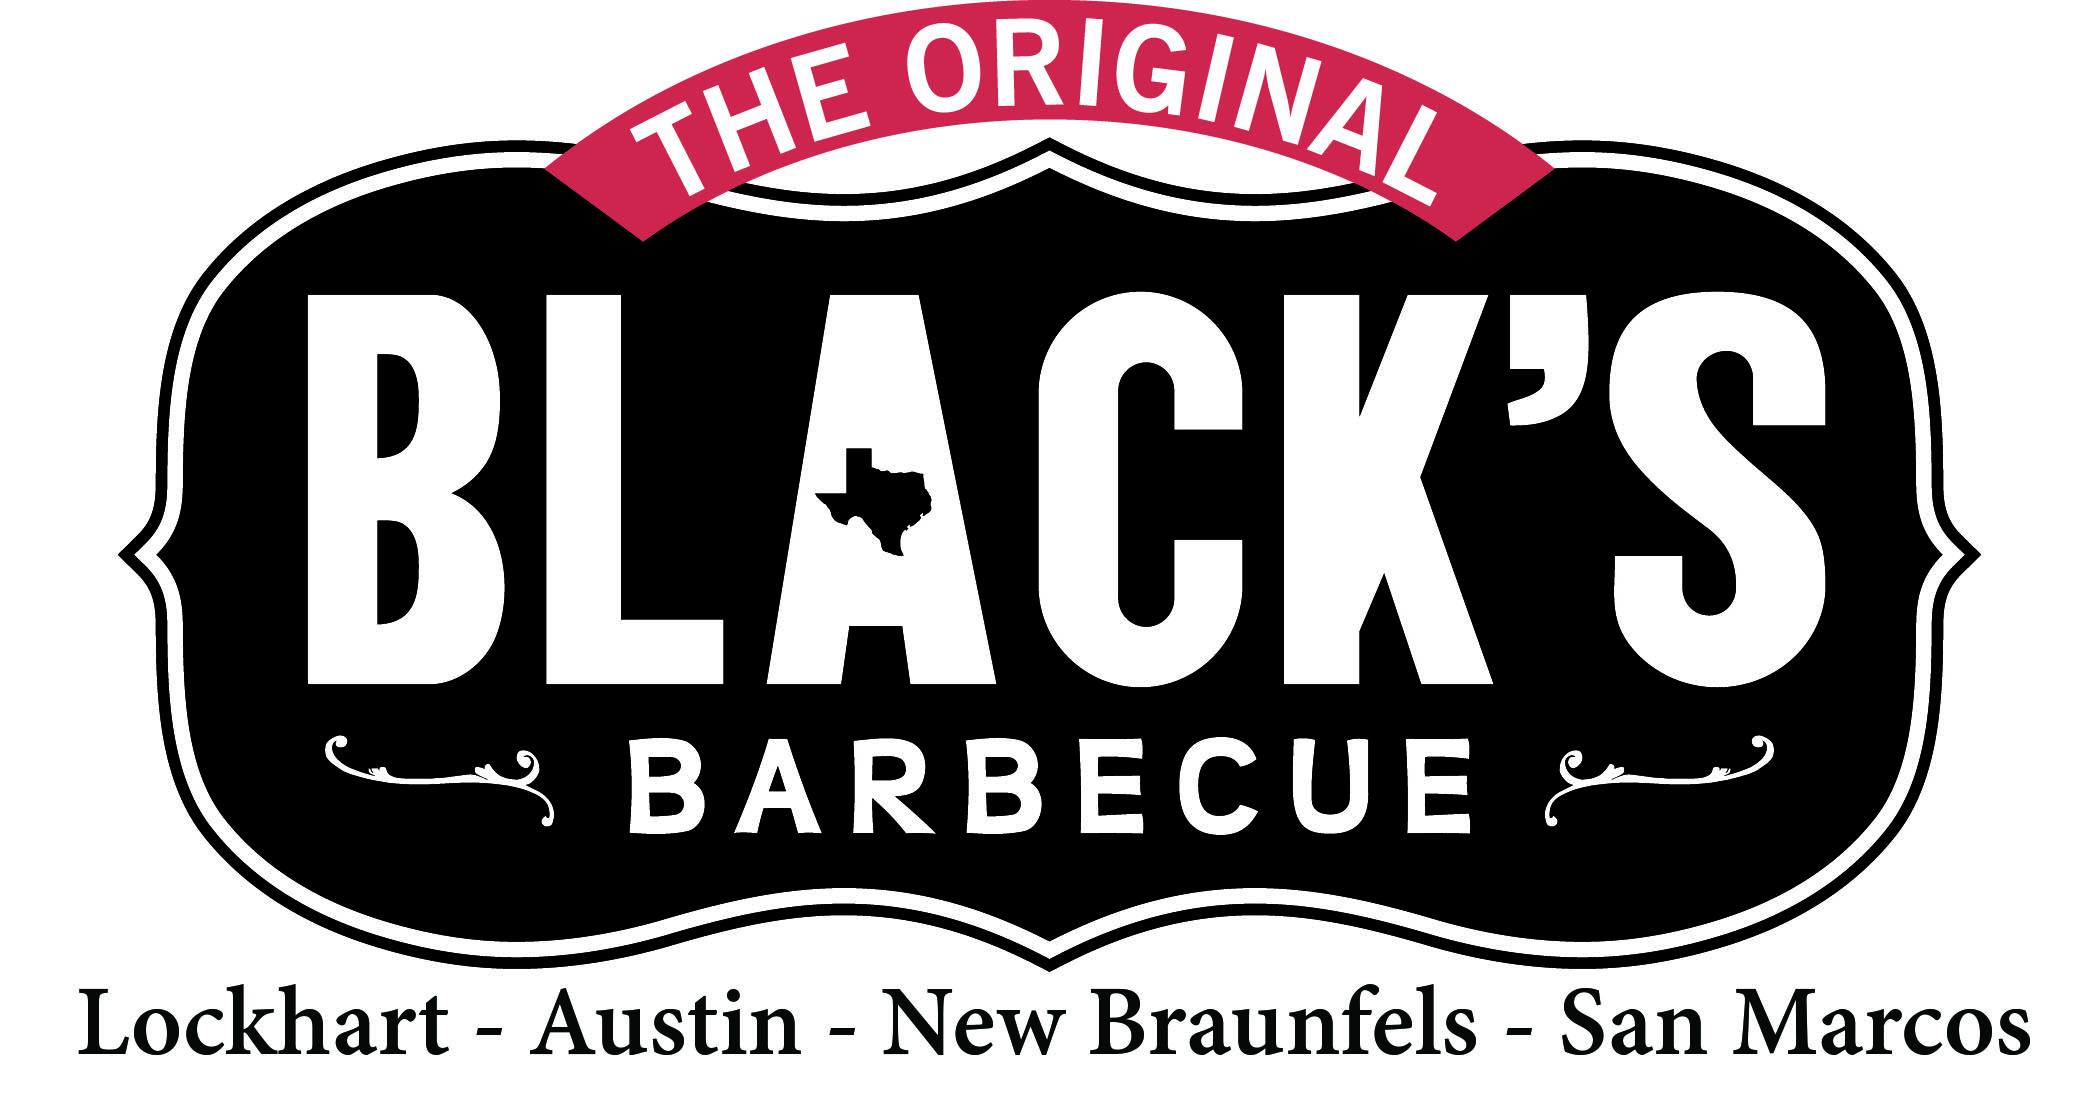 Black's Logo - The Original-Lockhart-Austin-NewBraunfels-SanMarcos (002)